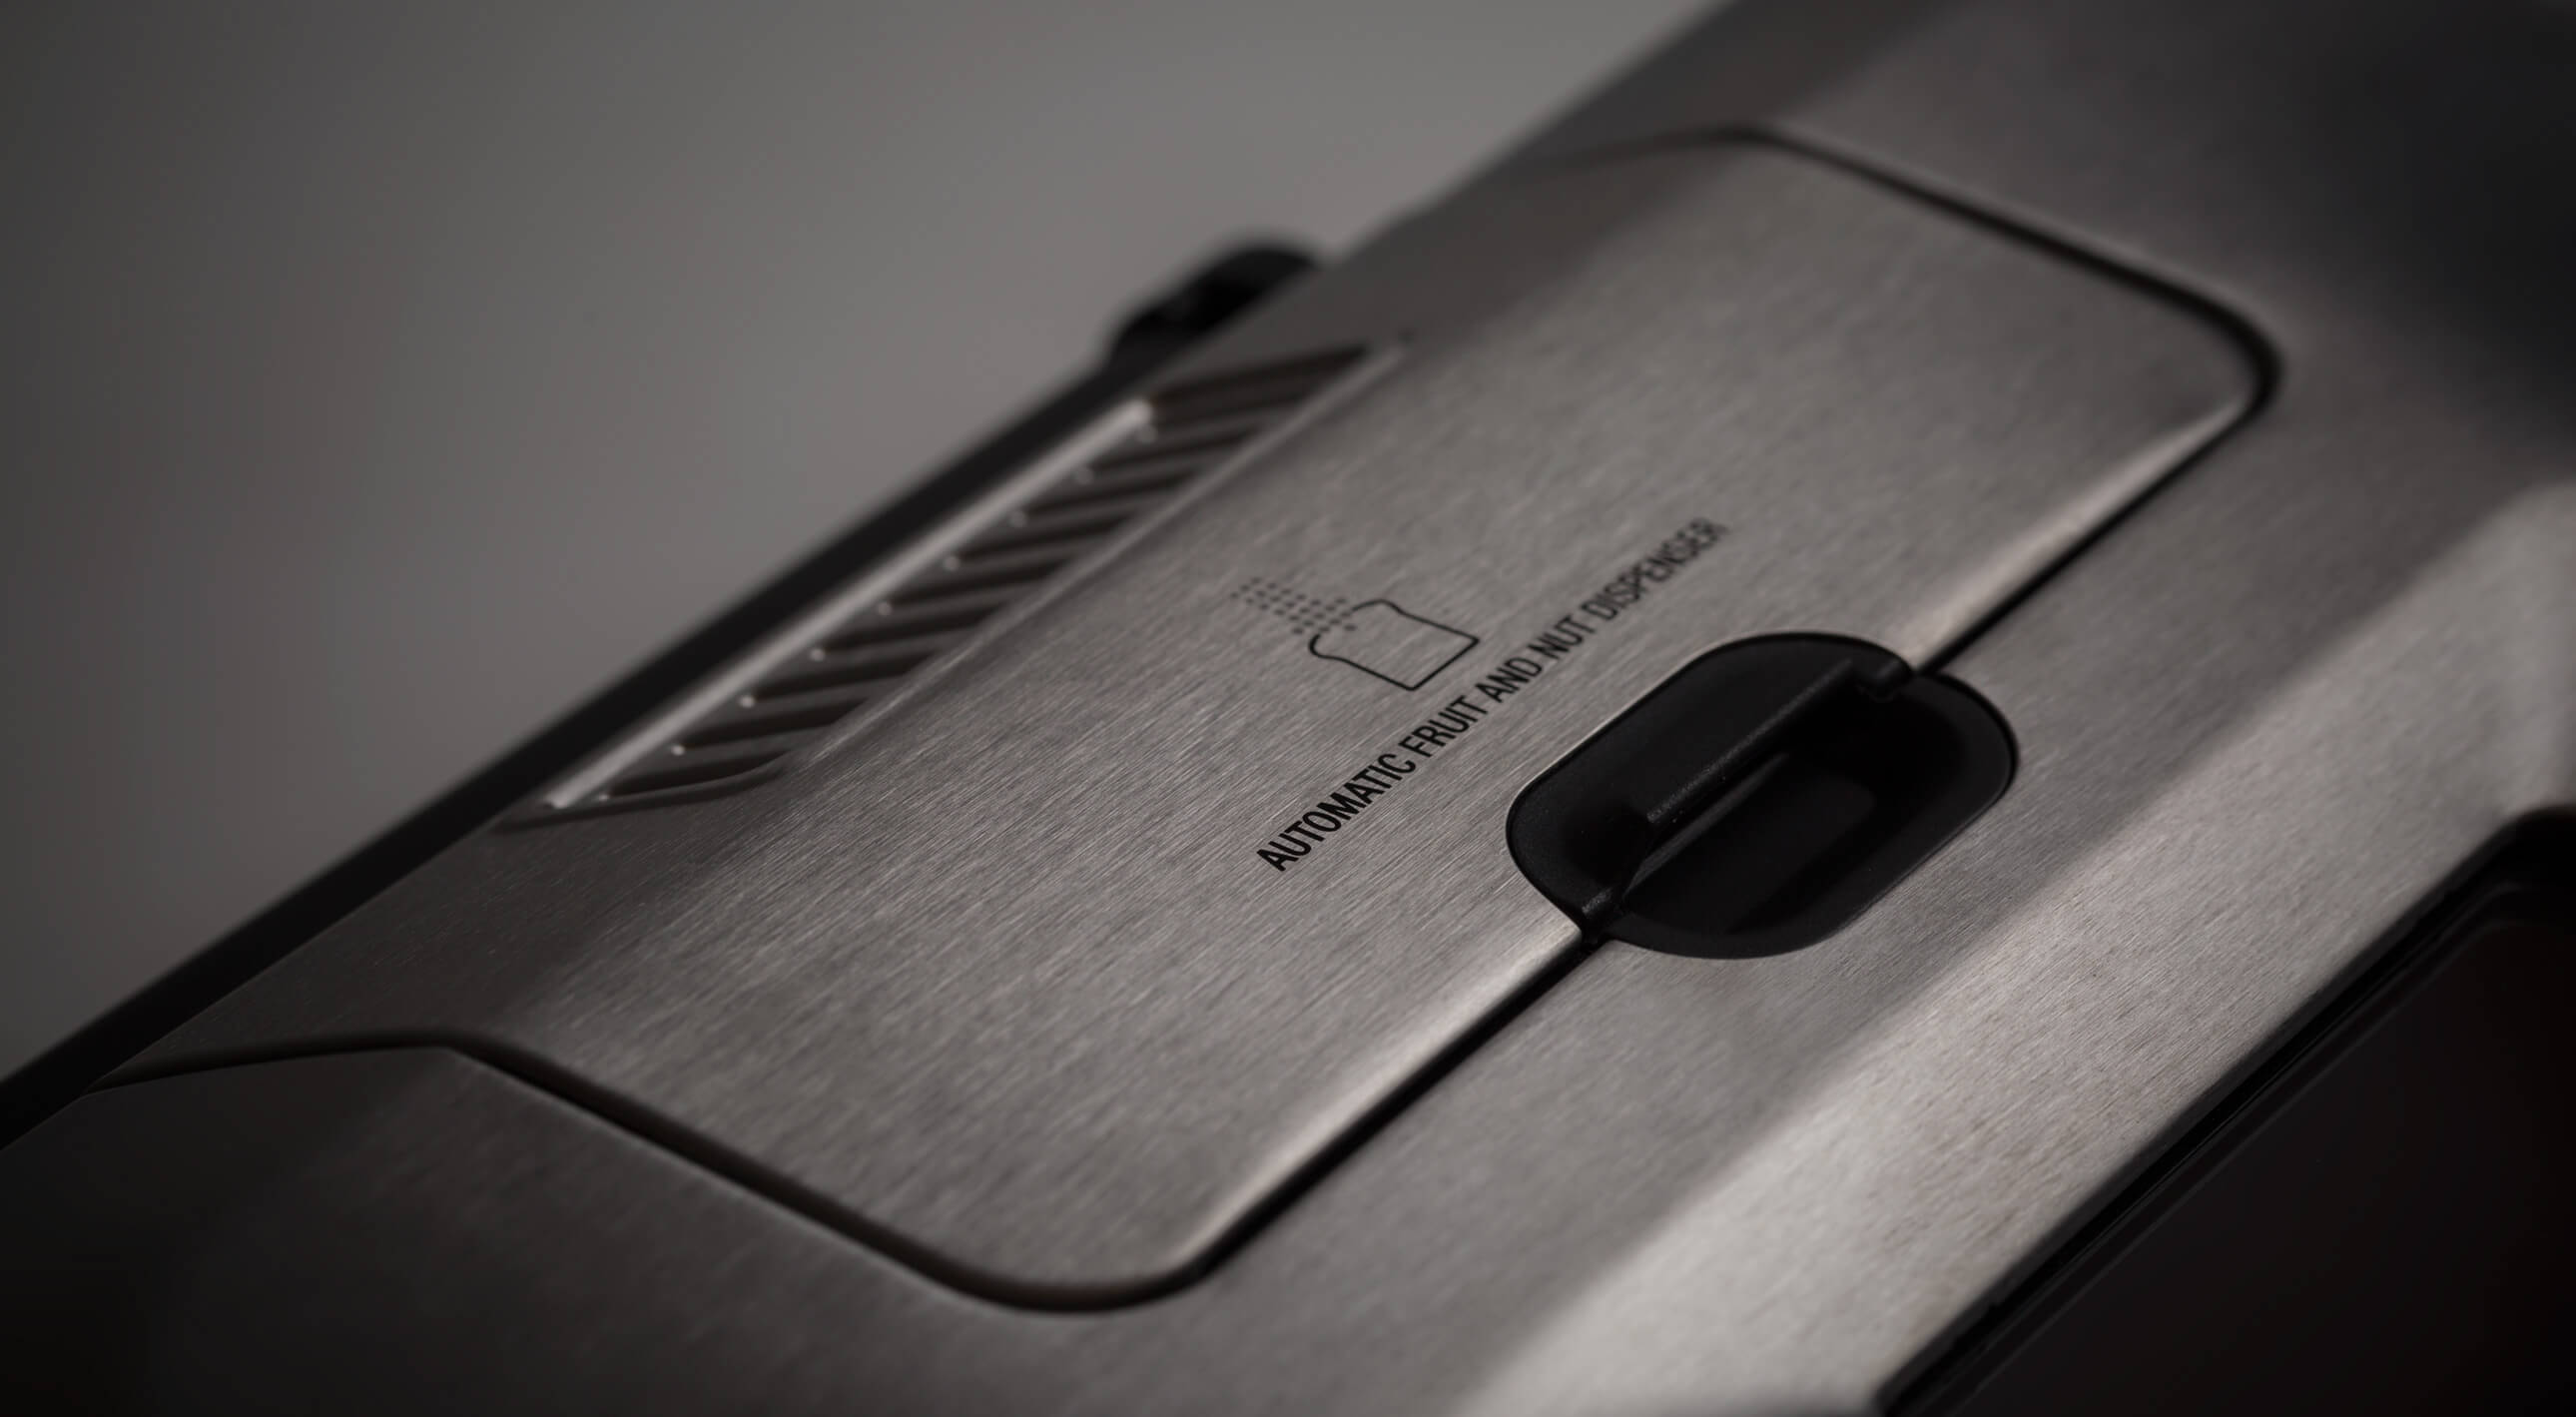 фотография хлебопечи BORK X800